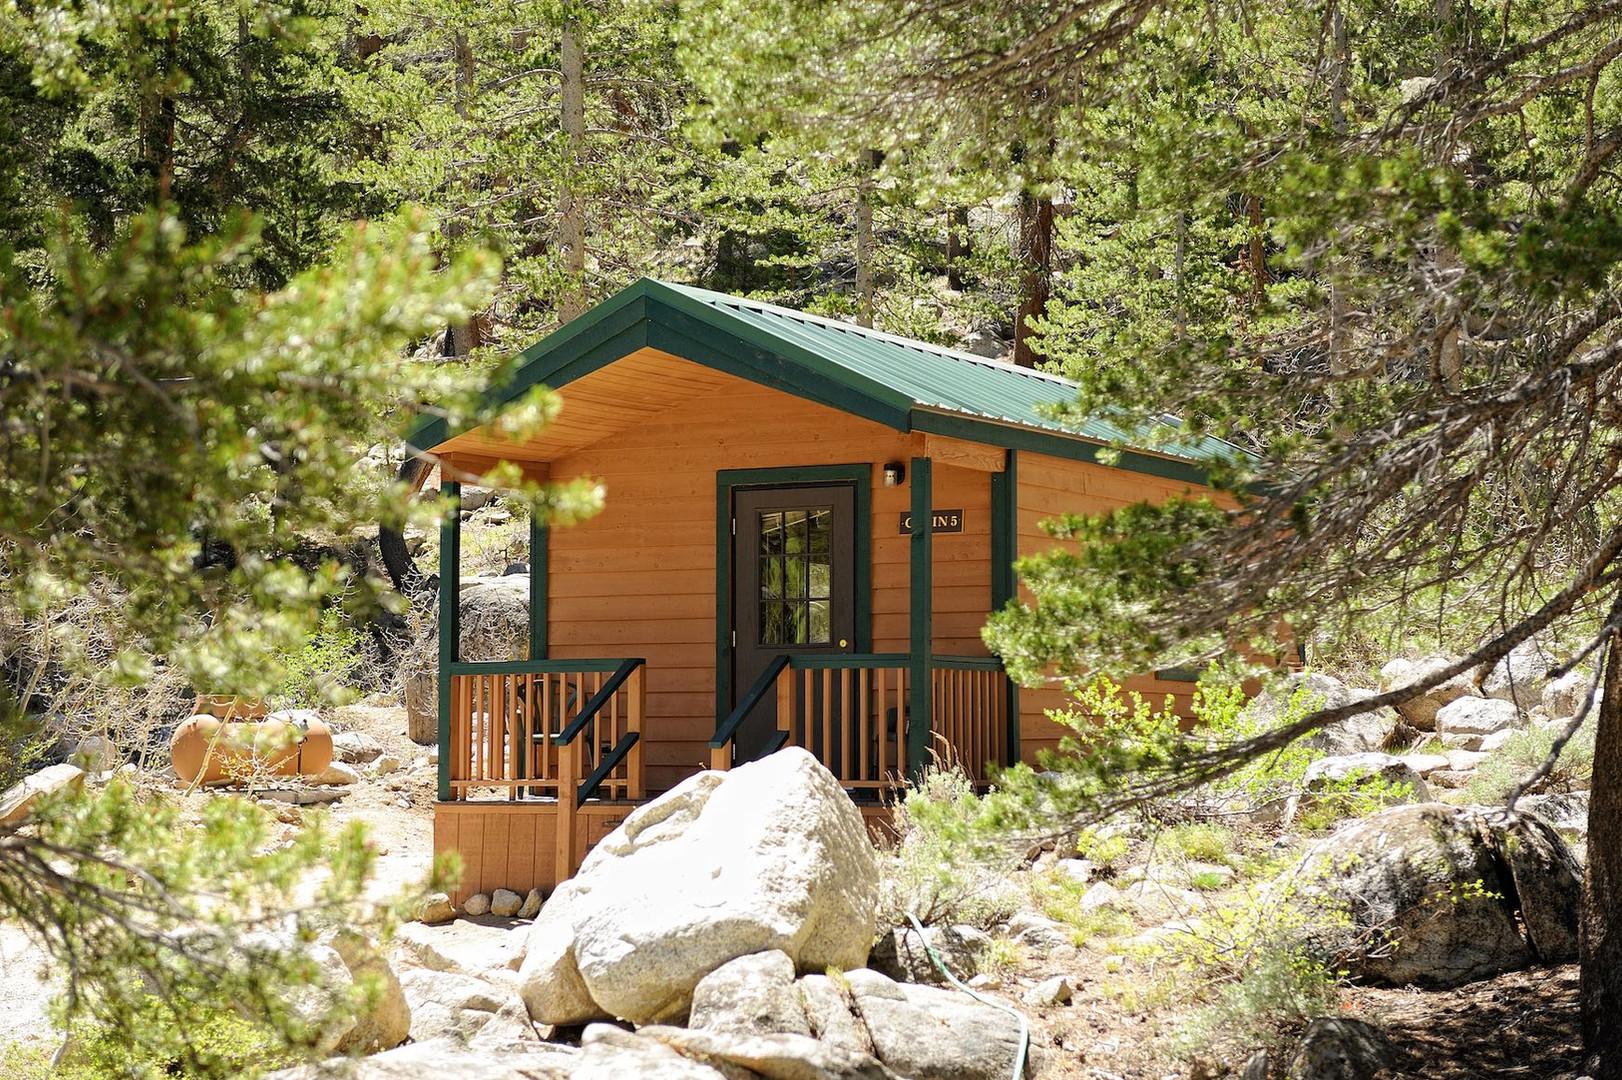 Hiker Cabins